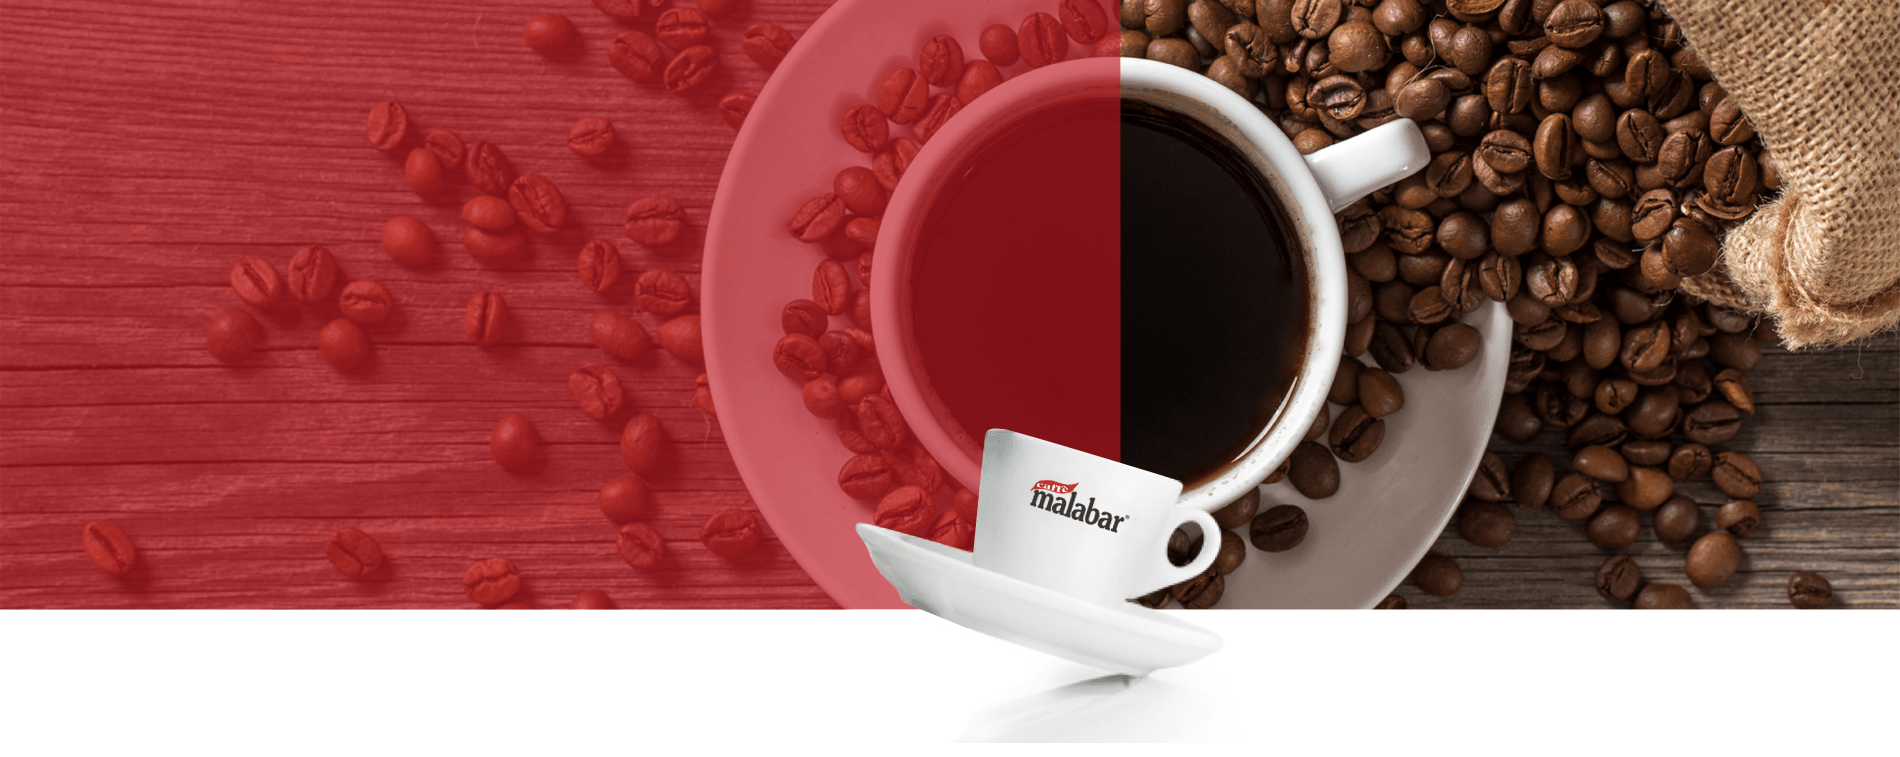 Caffè Malabar Tazzina Chicco Torino